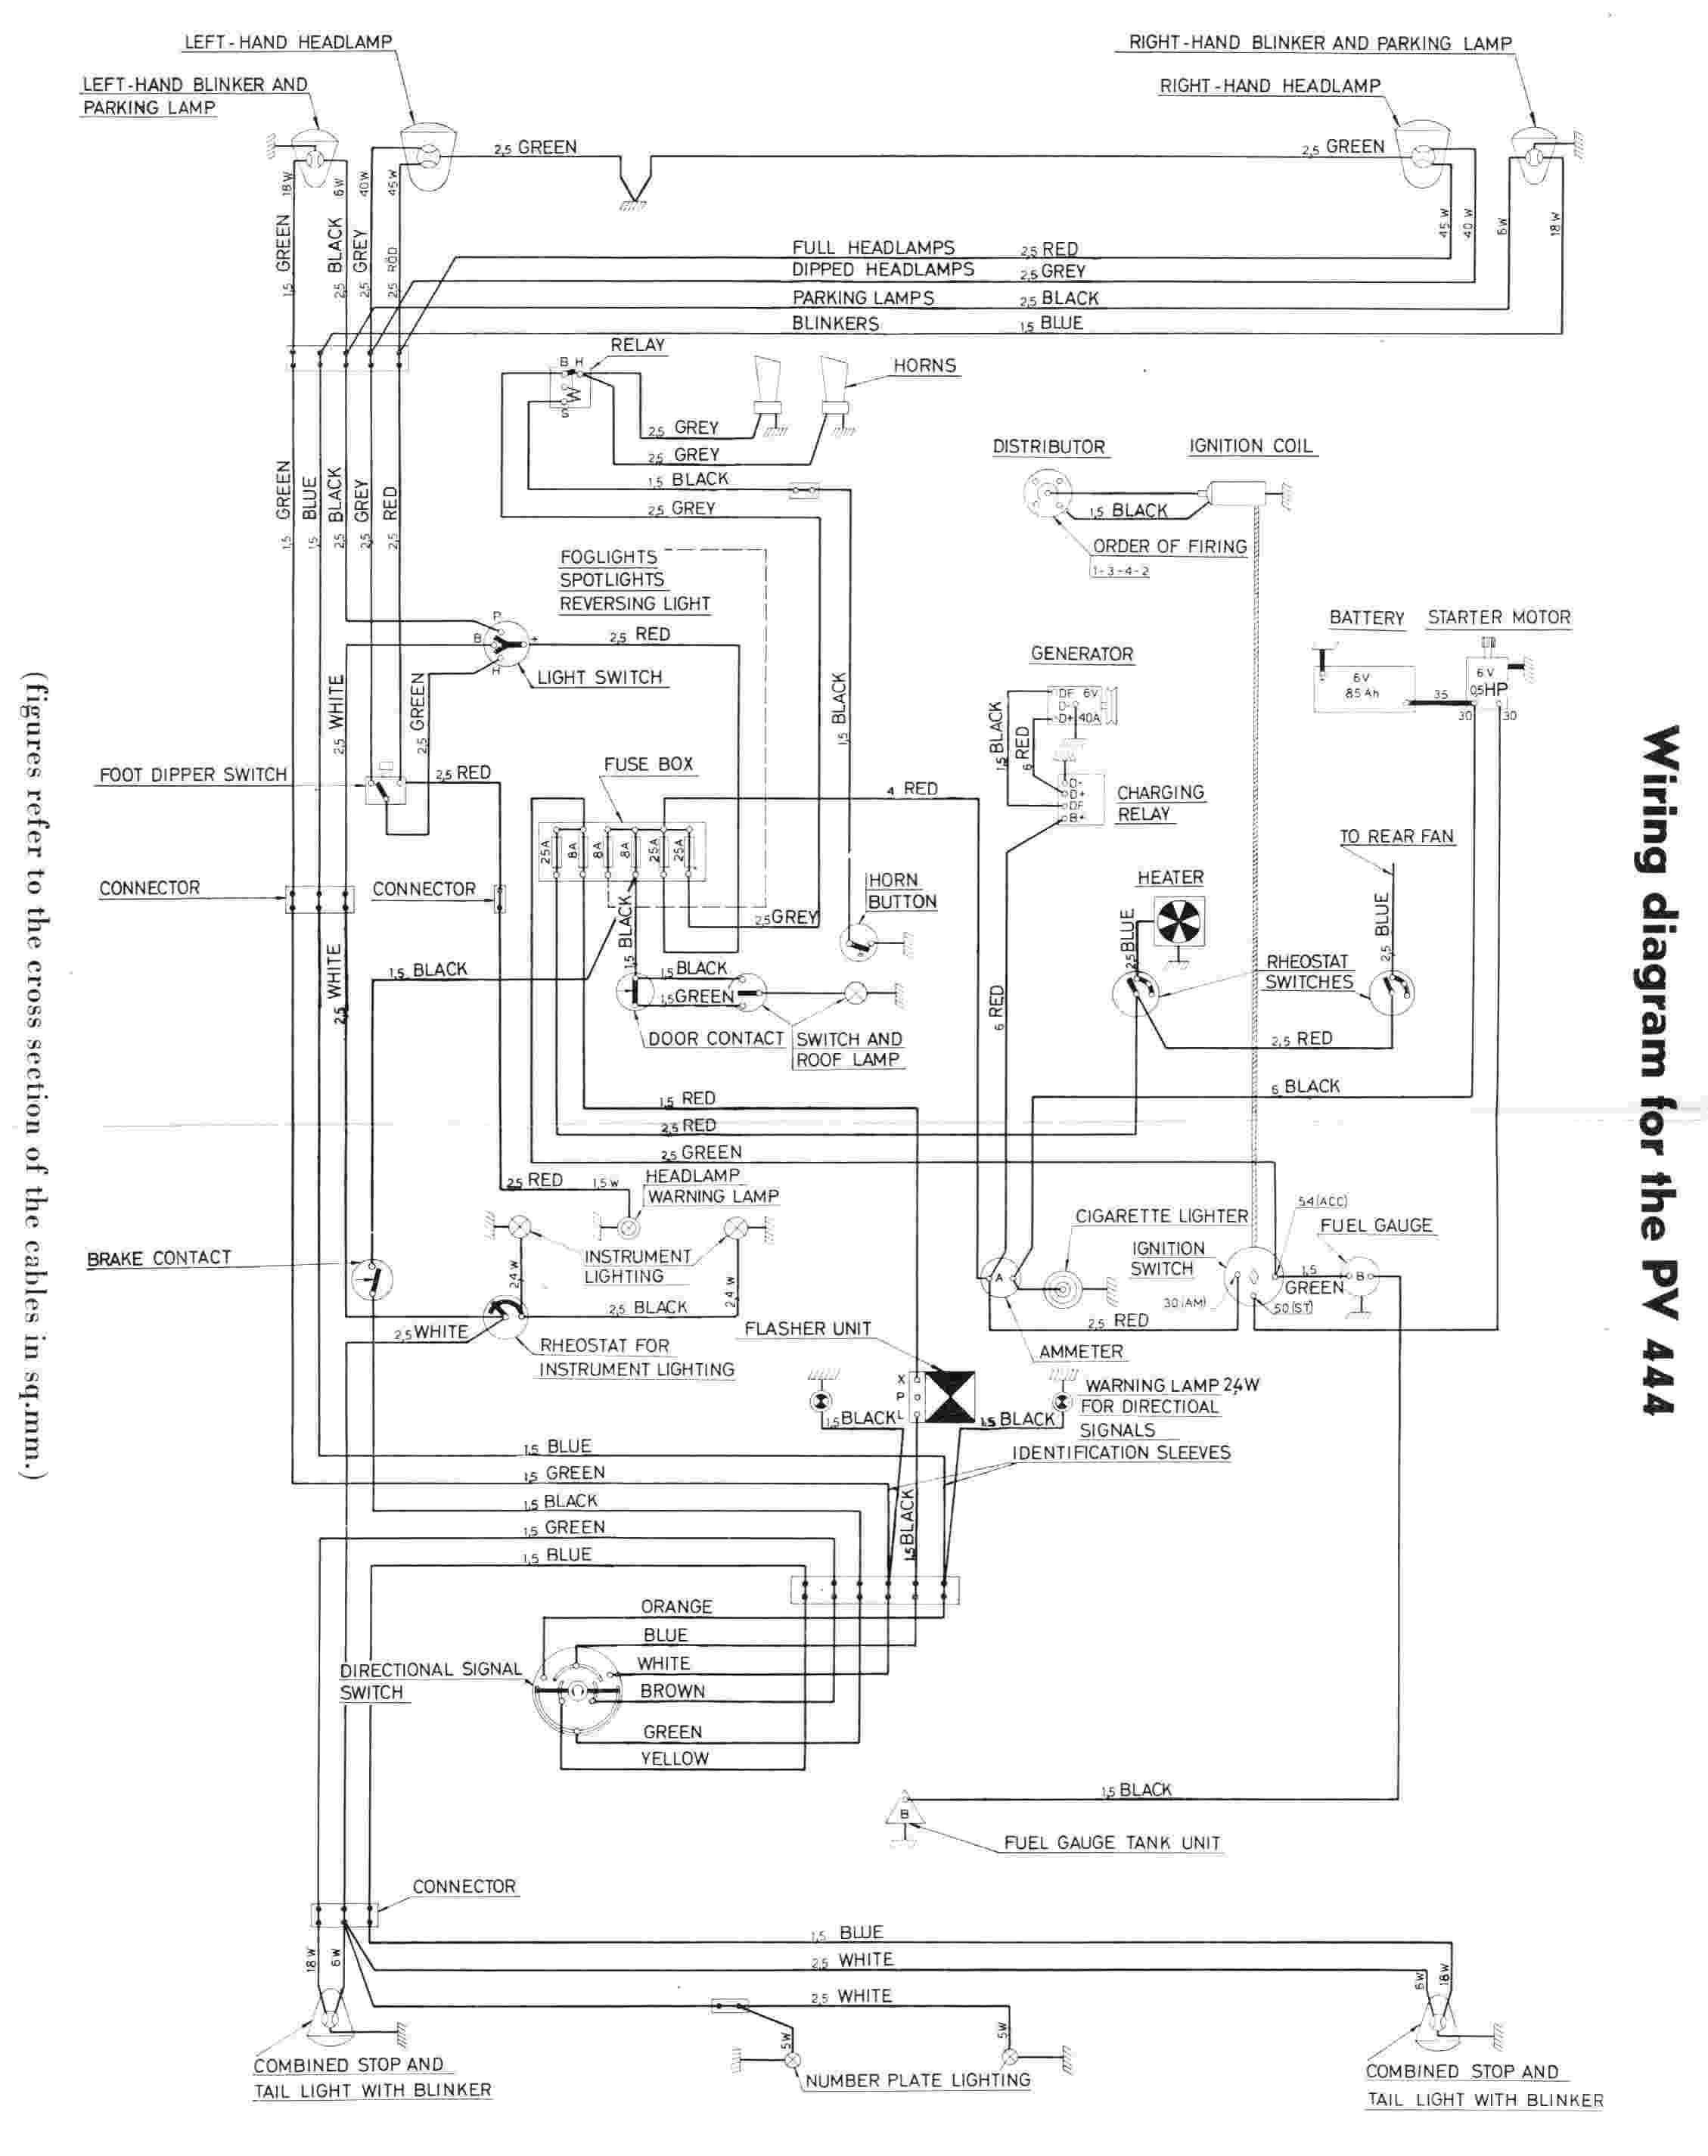 hight resolution of 1993 volvo 240 fuse diagram